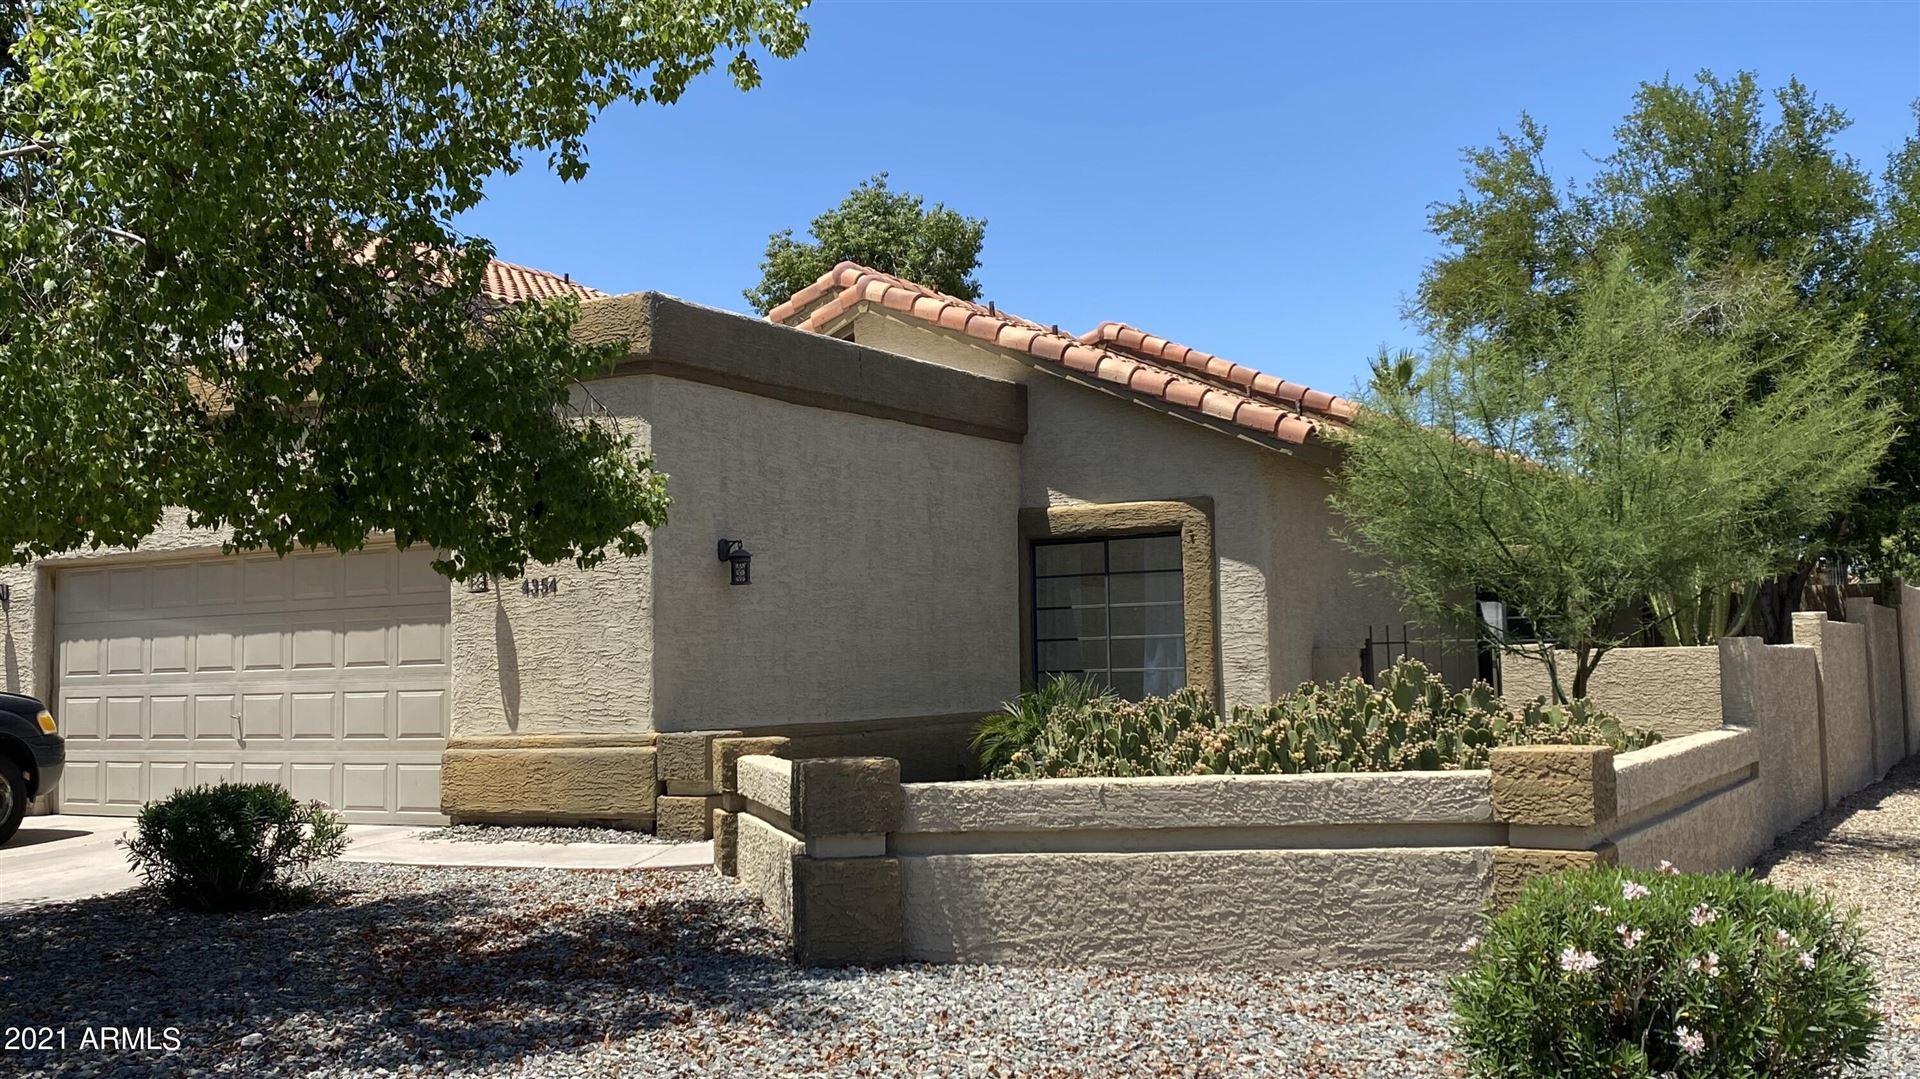 4354 E DRY CREEK Road, Phoenix, AZ 85044 - MLS#: 6238297